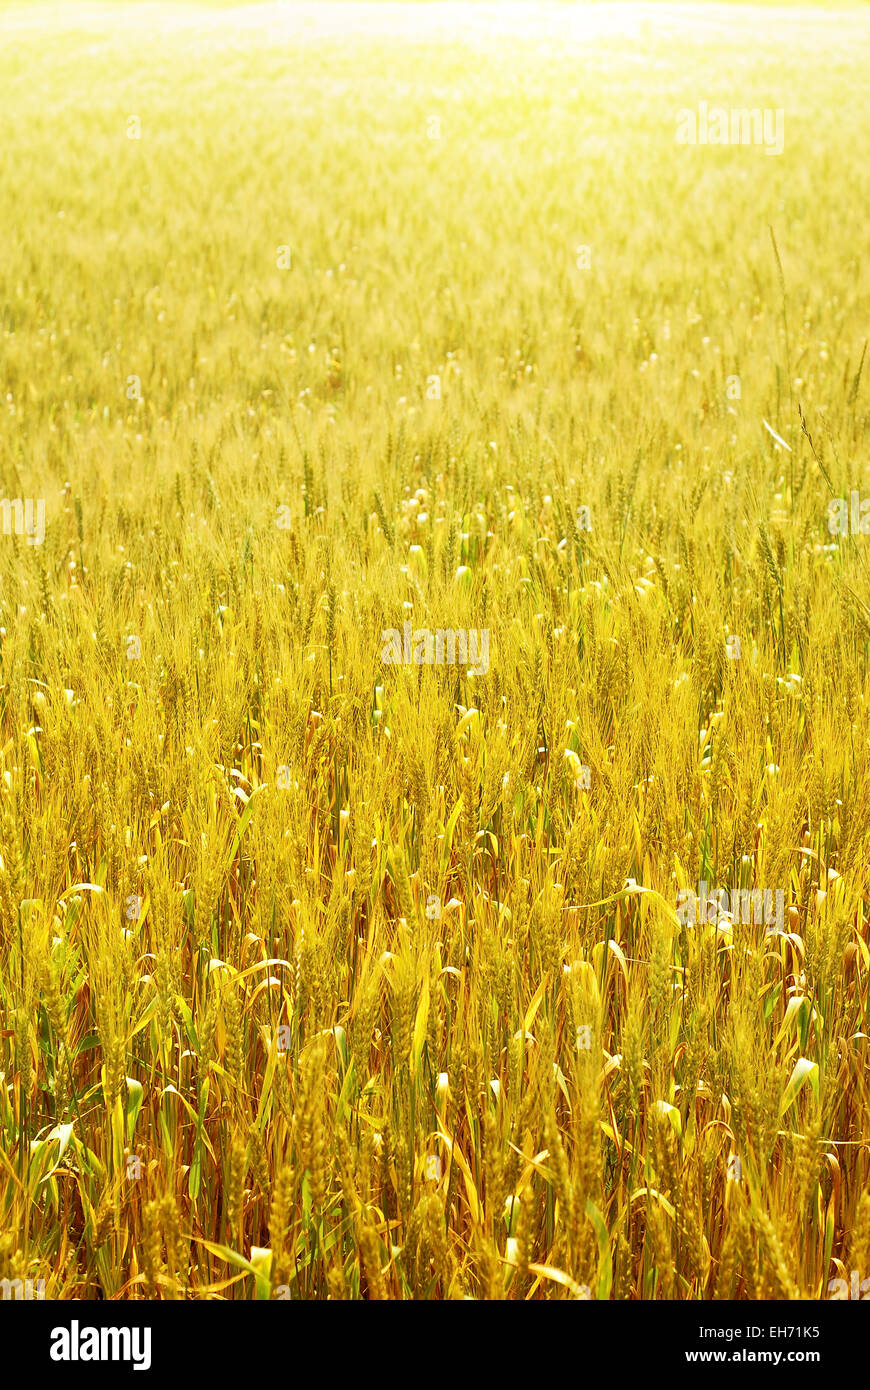 helles Weizen Feld vertikale Hintergrund Stockbild